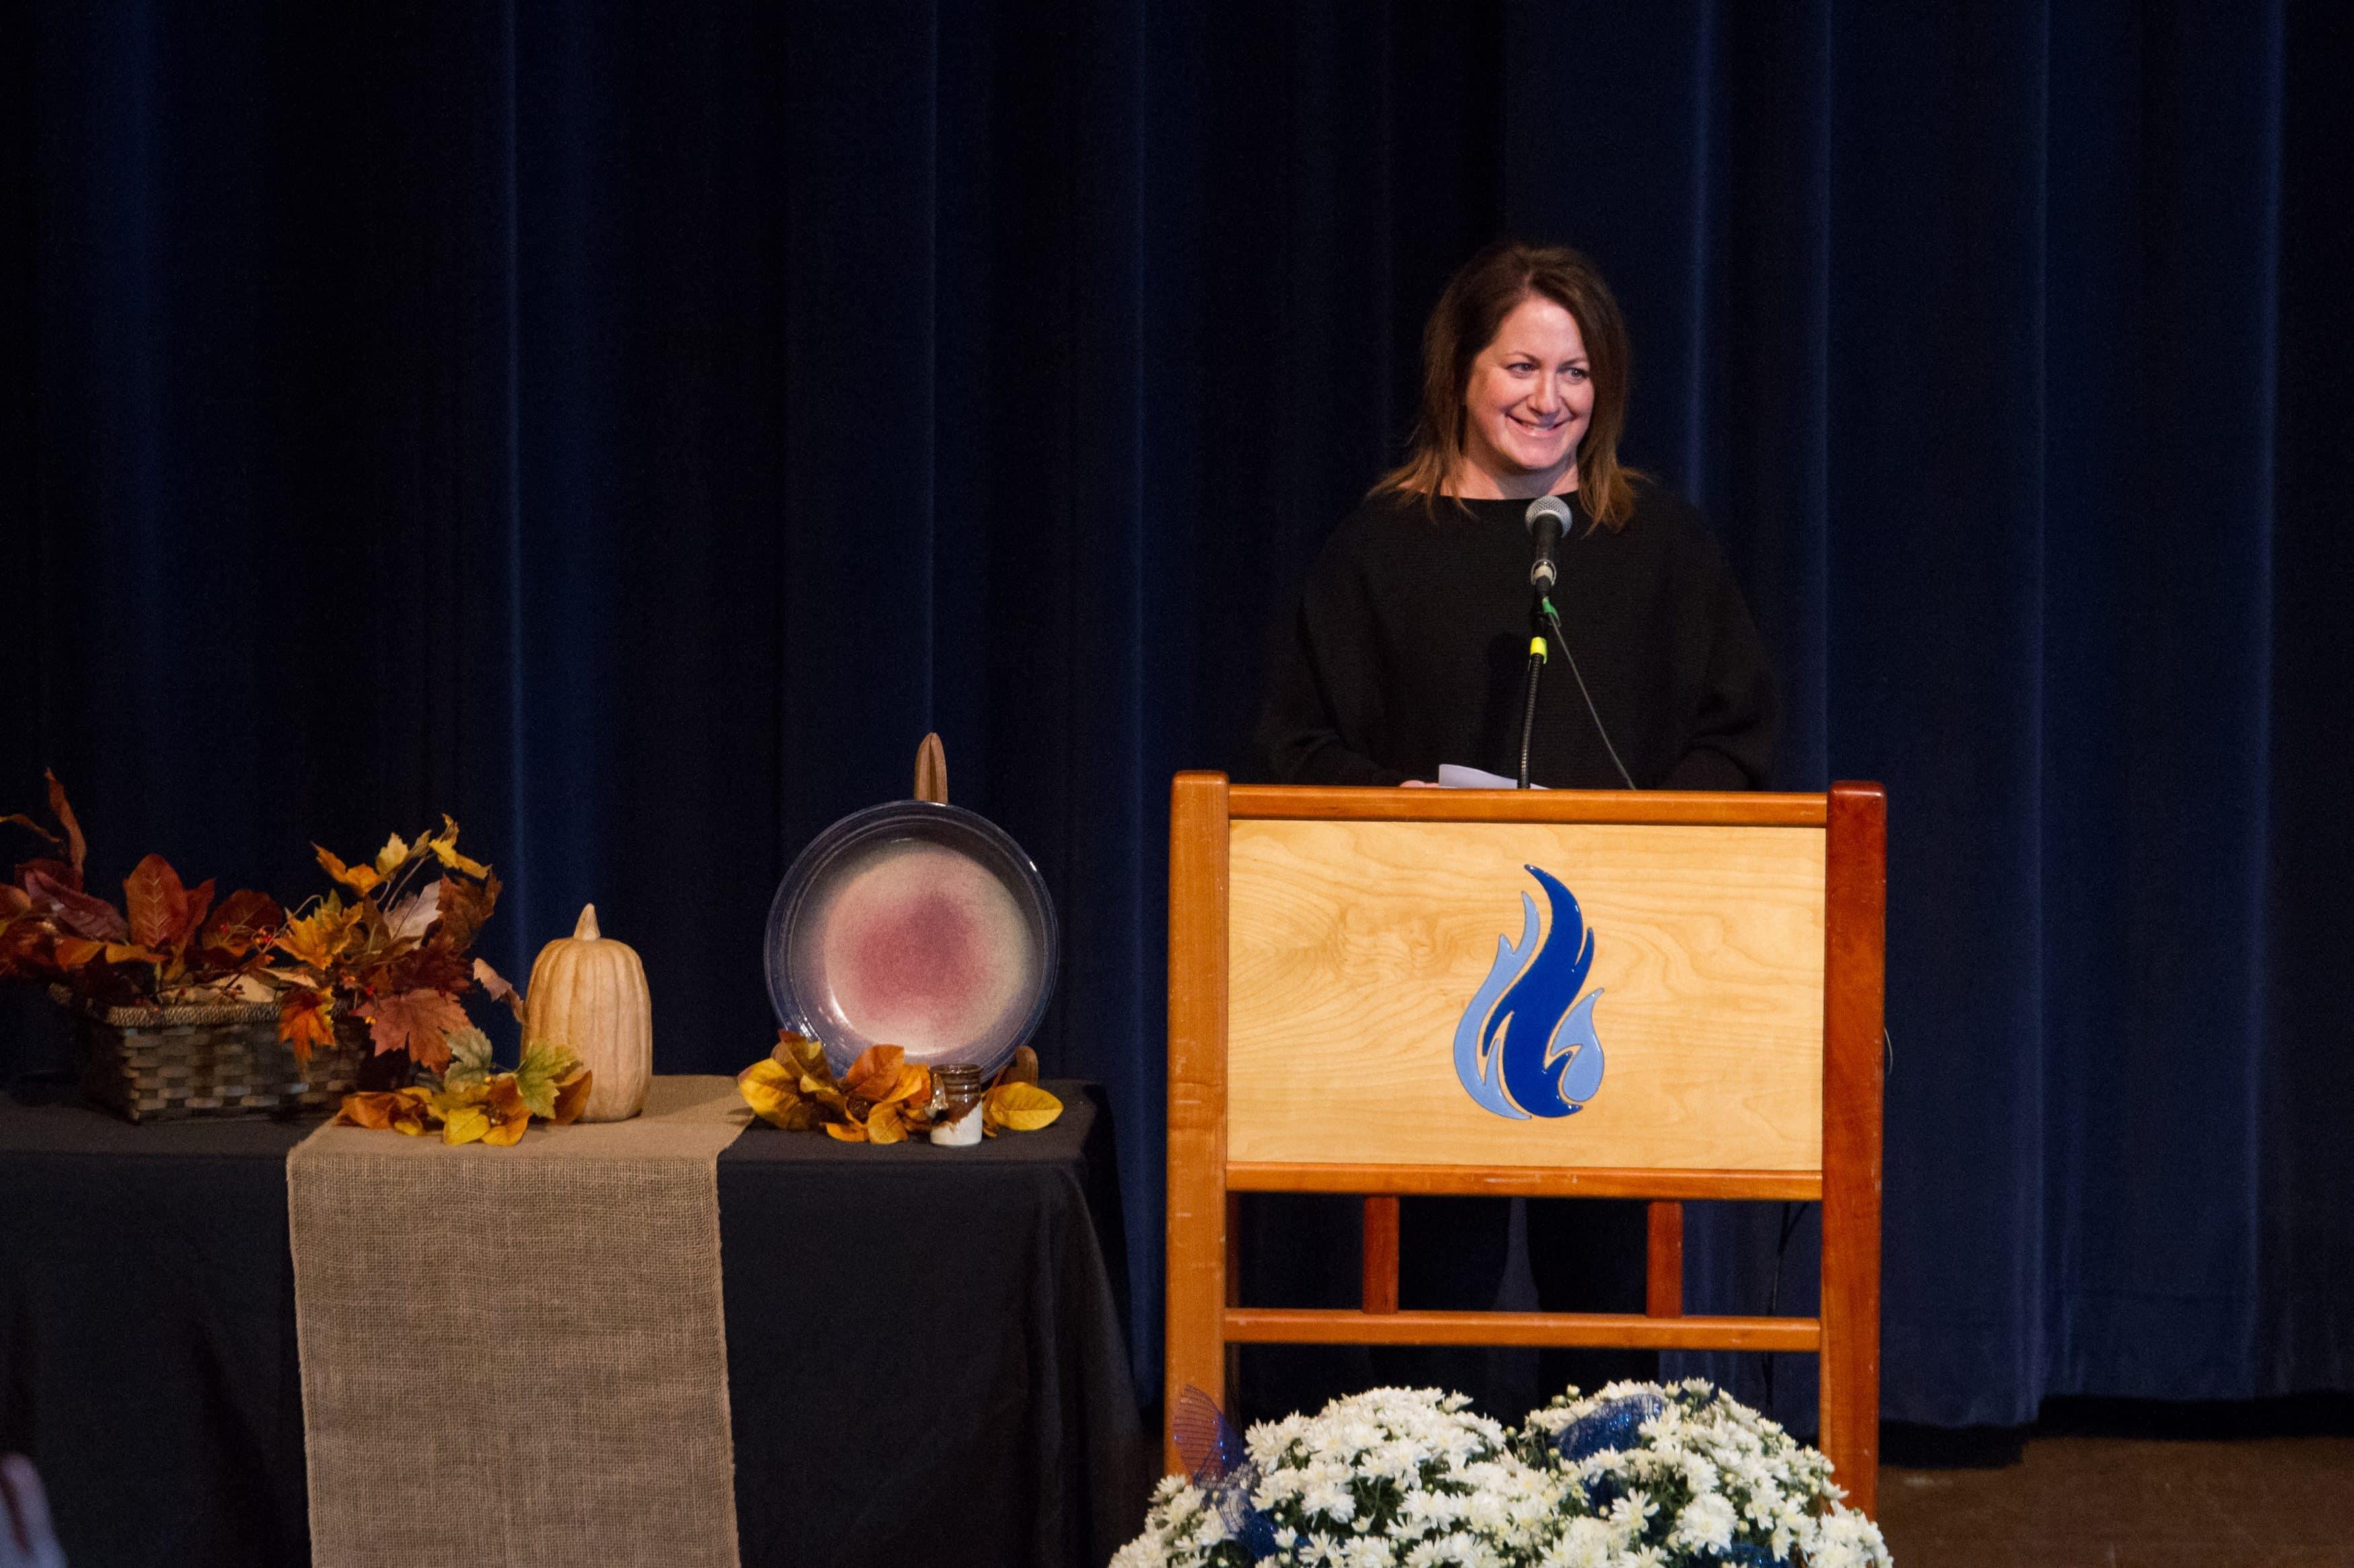 Kirsten Nafziger Moore, Community Engagement Awardee, speaking in chapel